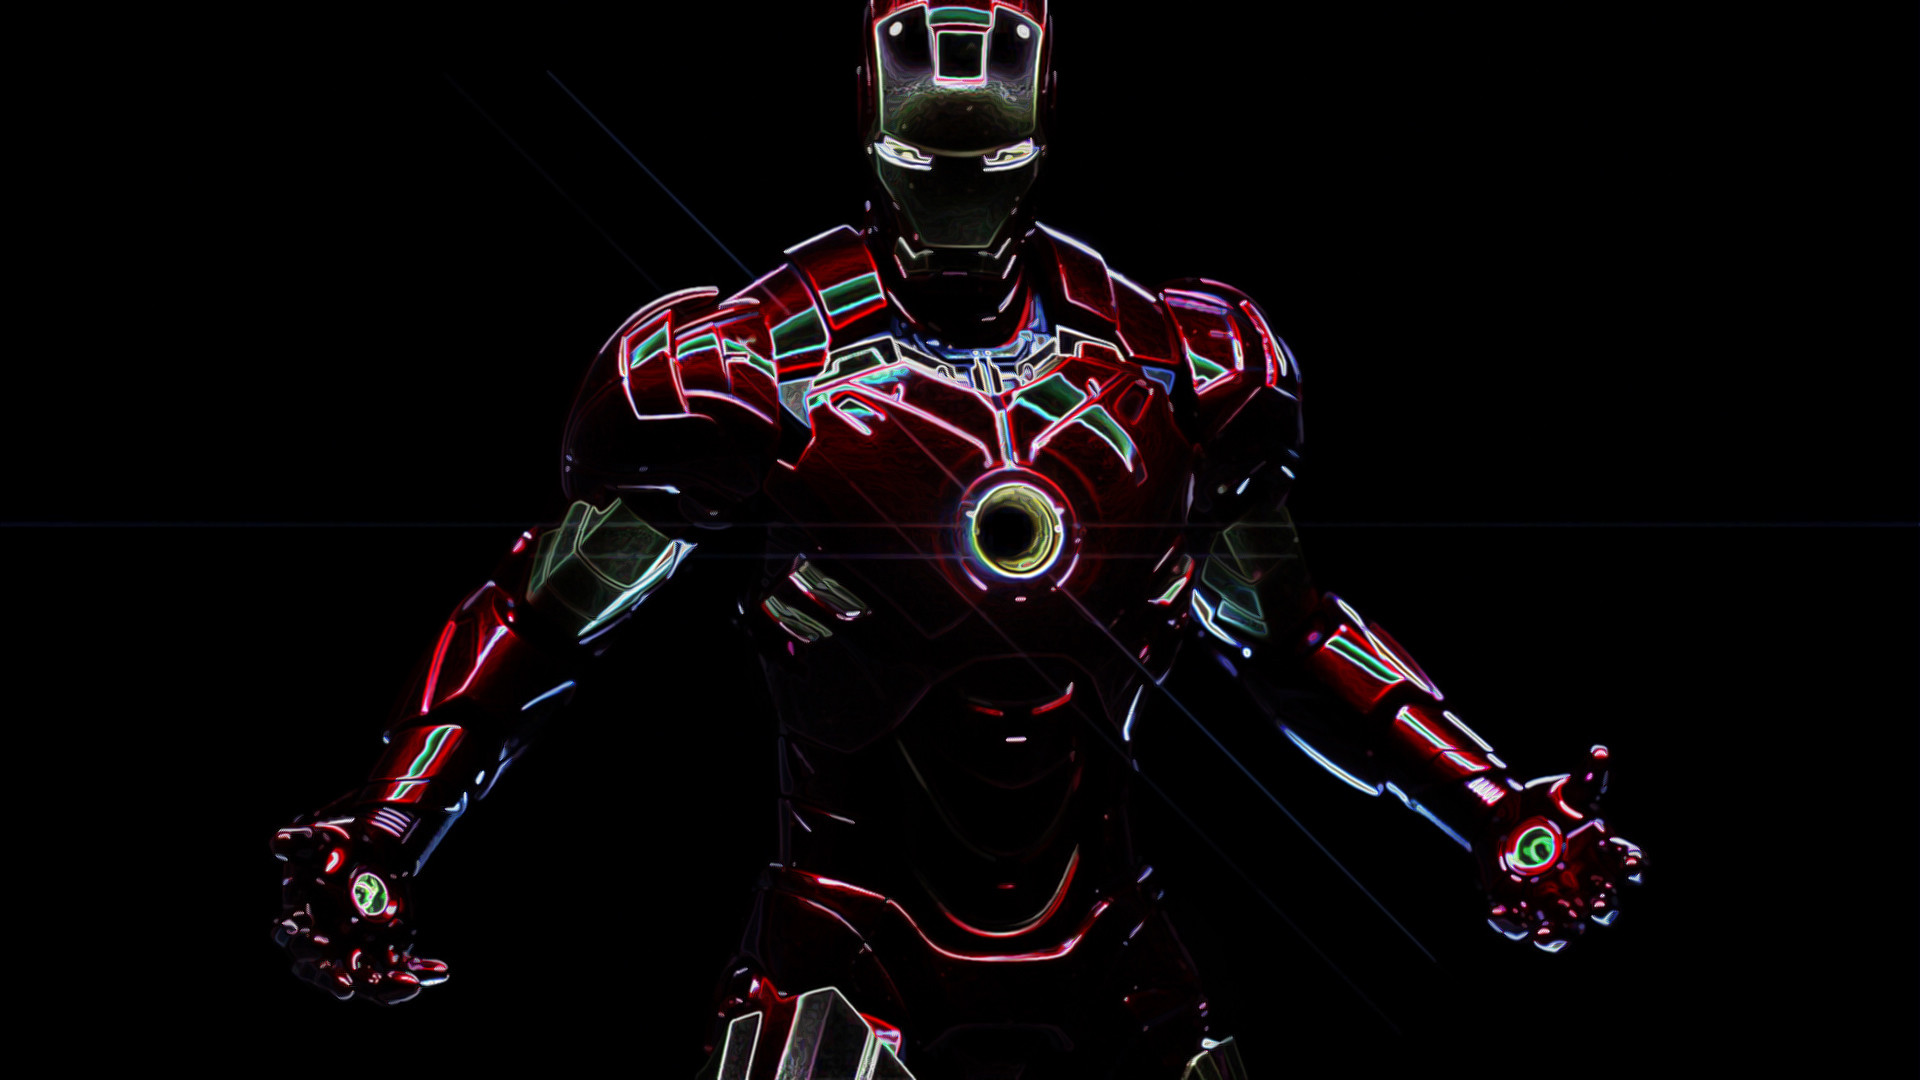 Iron Man Hd Wallpapers – image #780759